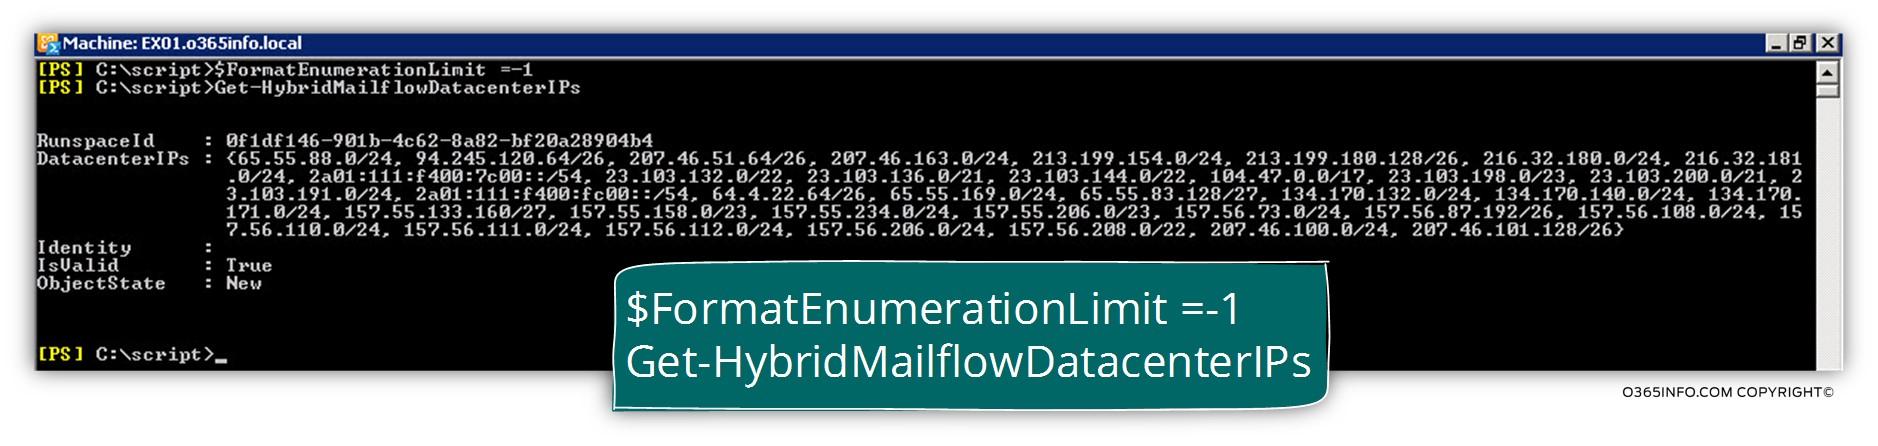 Get the IP address of Exchange Online data center -01